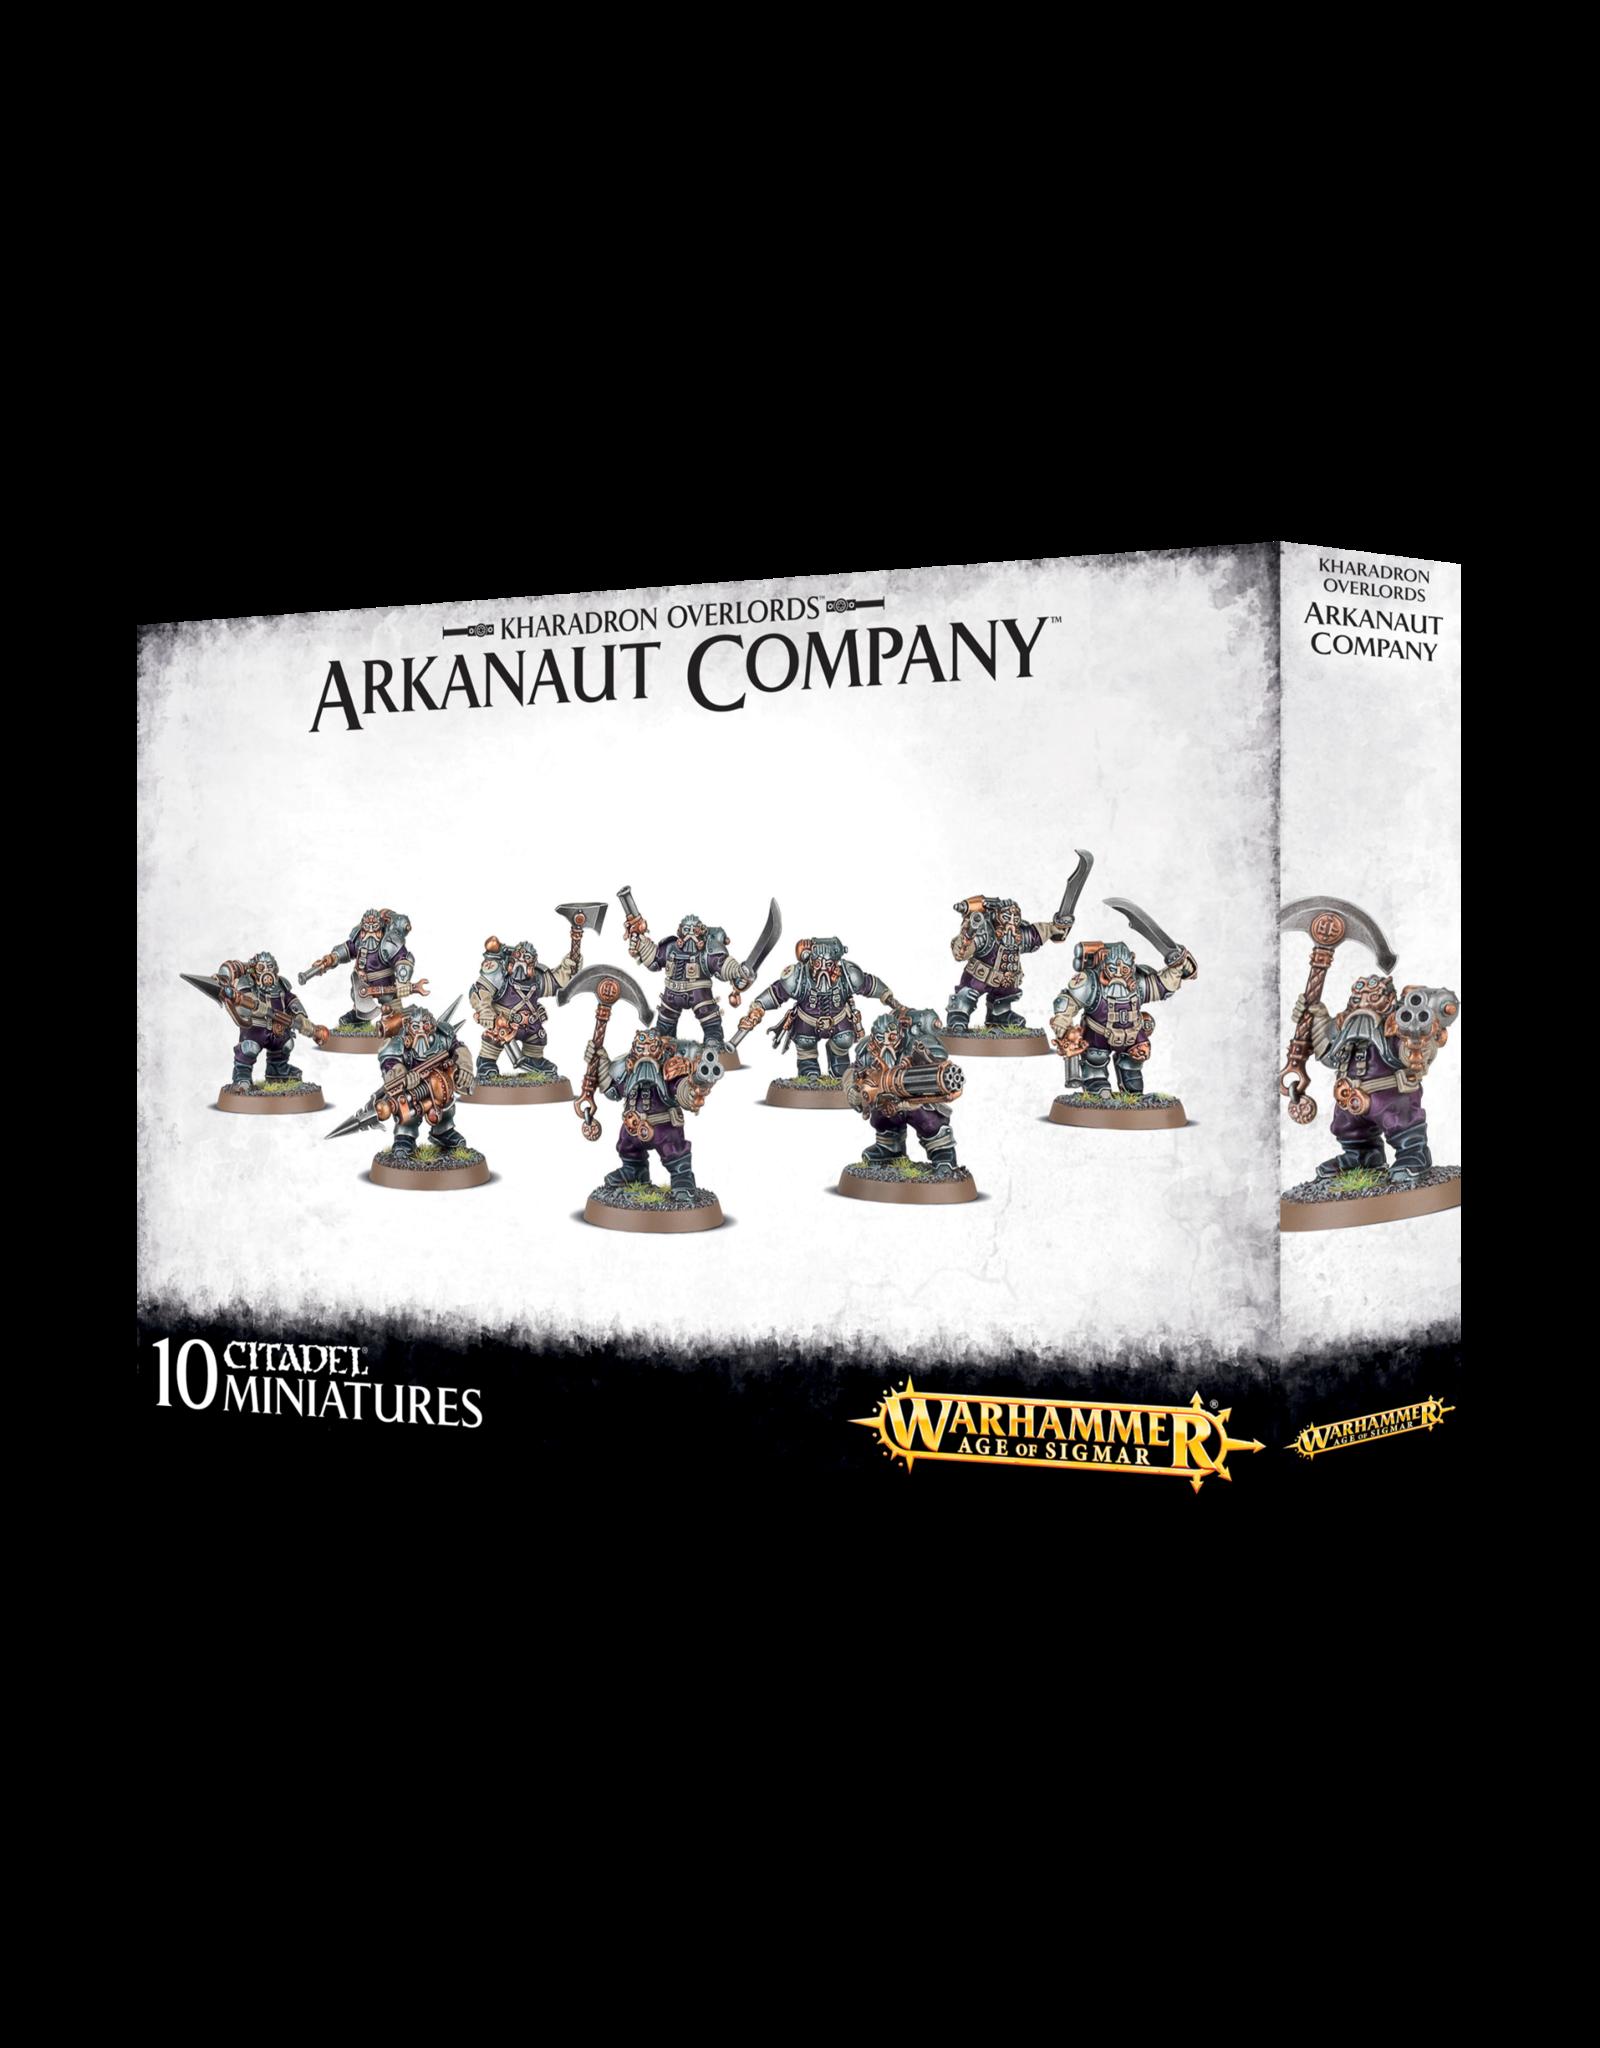 Warhammer Age of Sigmar Arkanaut Company